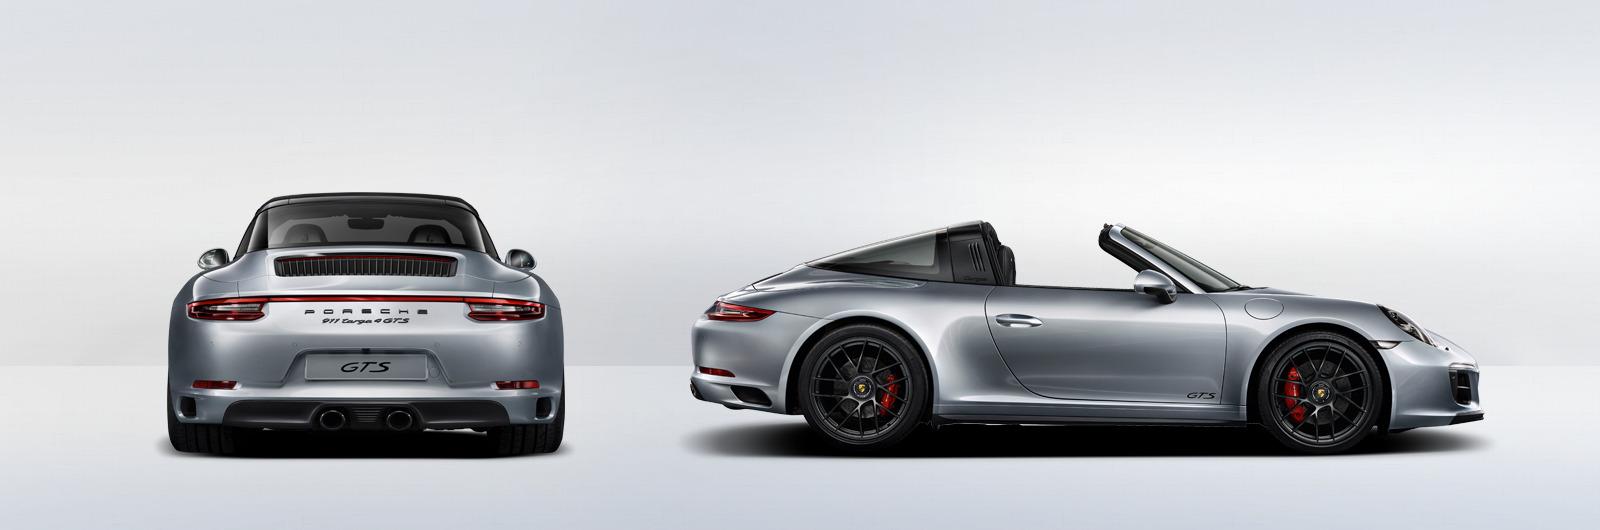 Porsche 911 Targa 4 Gts Technical Specs Porsche Middle East